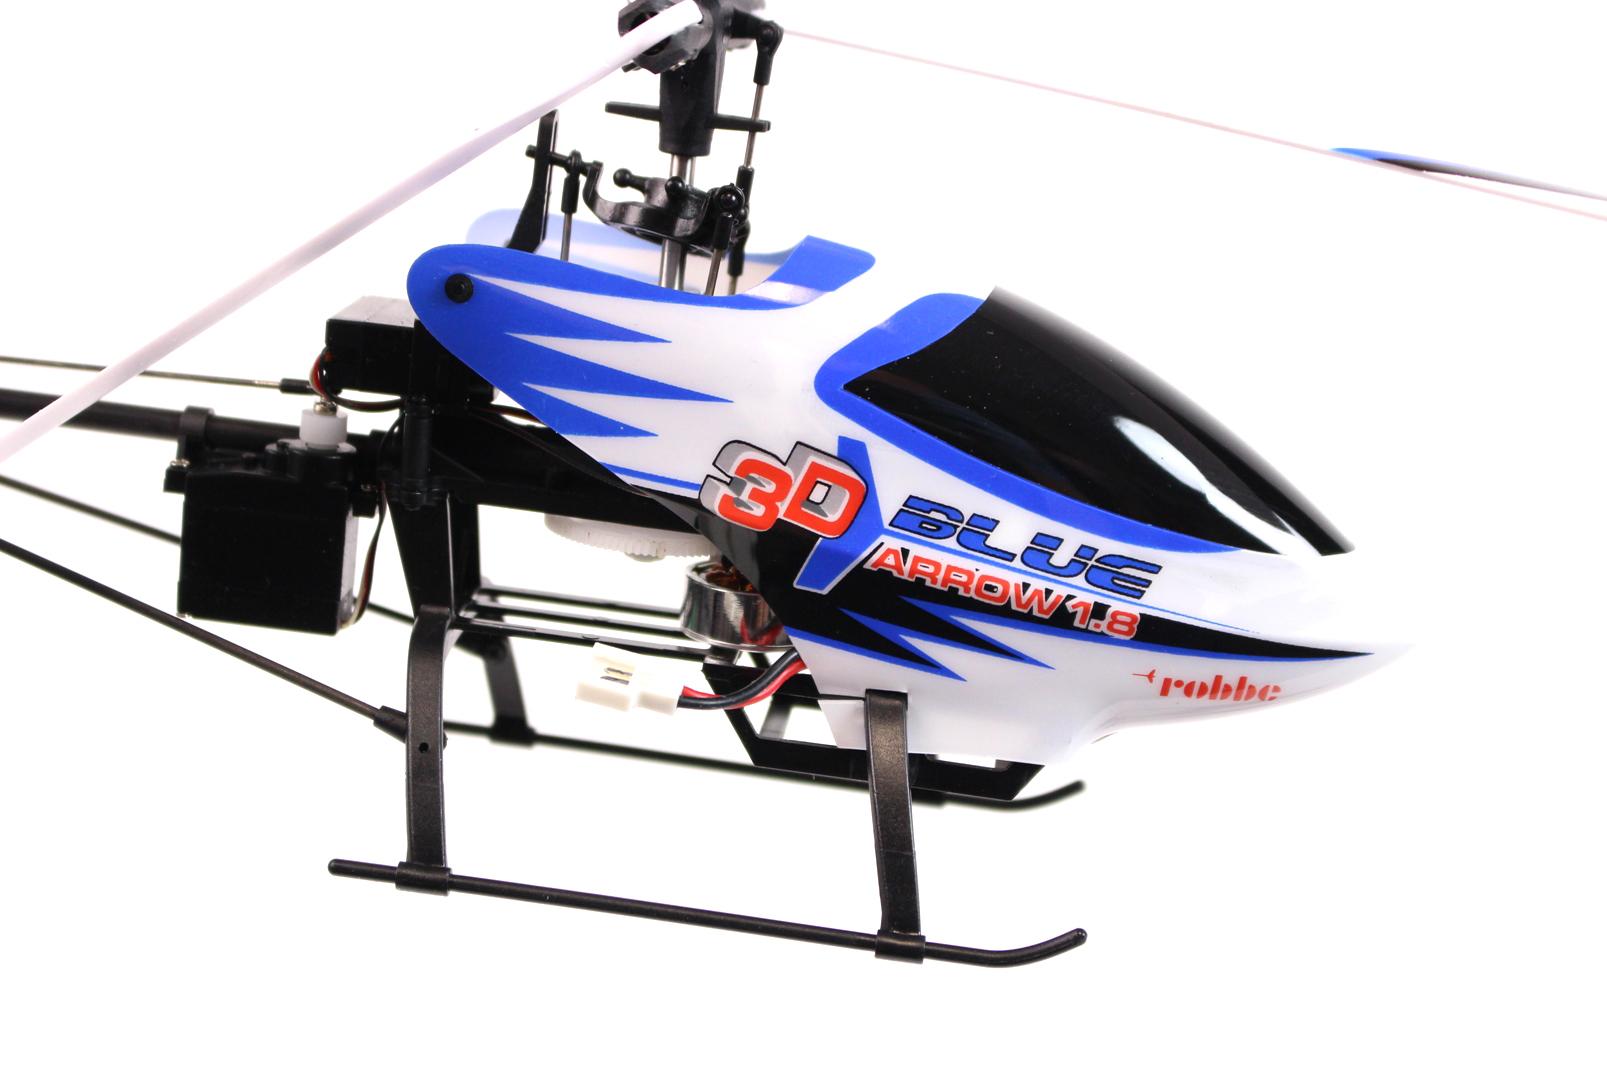 robbe blue arrow 1 8 3d mini hubschrauber 2 4 ghz 4 servos helicopter heli ovp ebay. Black Bedroom Furniture Sets. Home Design Ideas